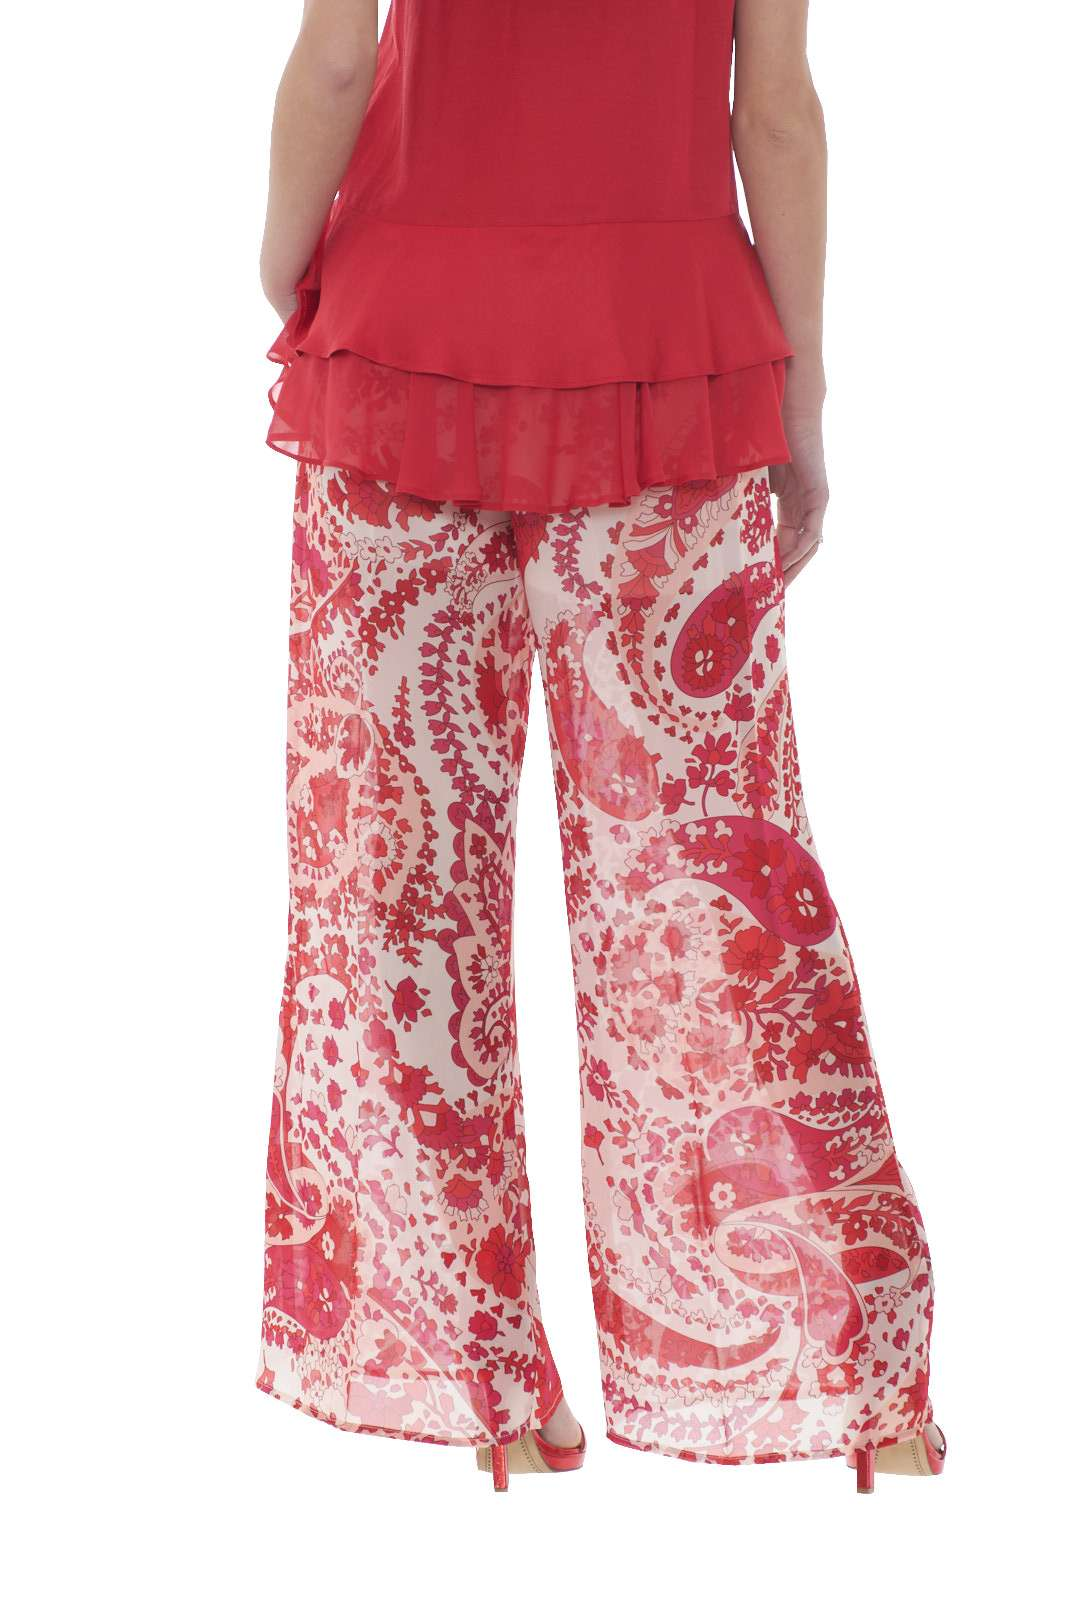 https://www.parmax.com/media/catalog/product/a/i/PE-outlet_parmax-pantaloni-donna-TwinSet-201TP2536-C.jpg